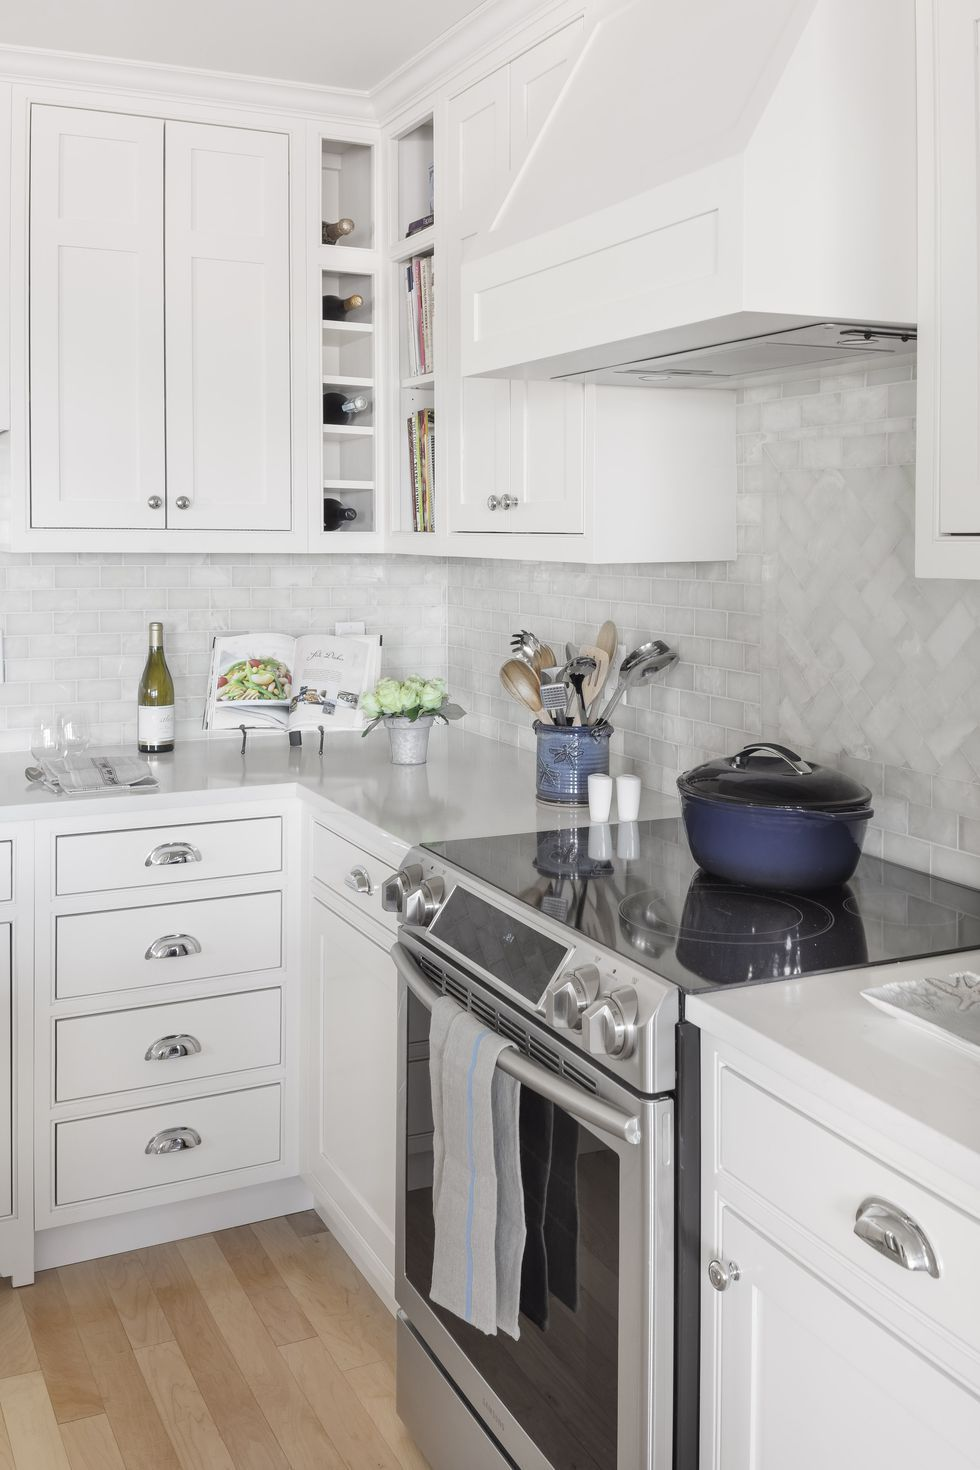 20 gorgeous kitchen tile backsplashes best kitchen tile ideas rh elledecor com kitchen backsplash trends 2018 kitchen backsplash pictures